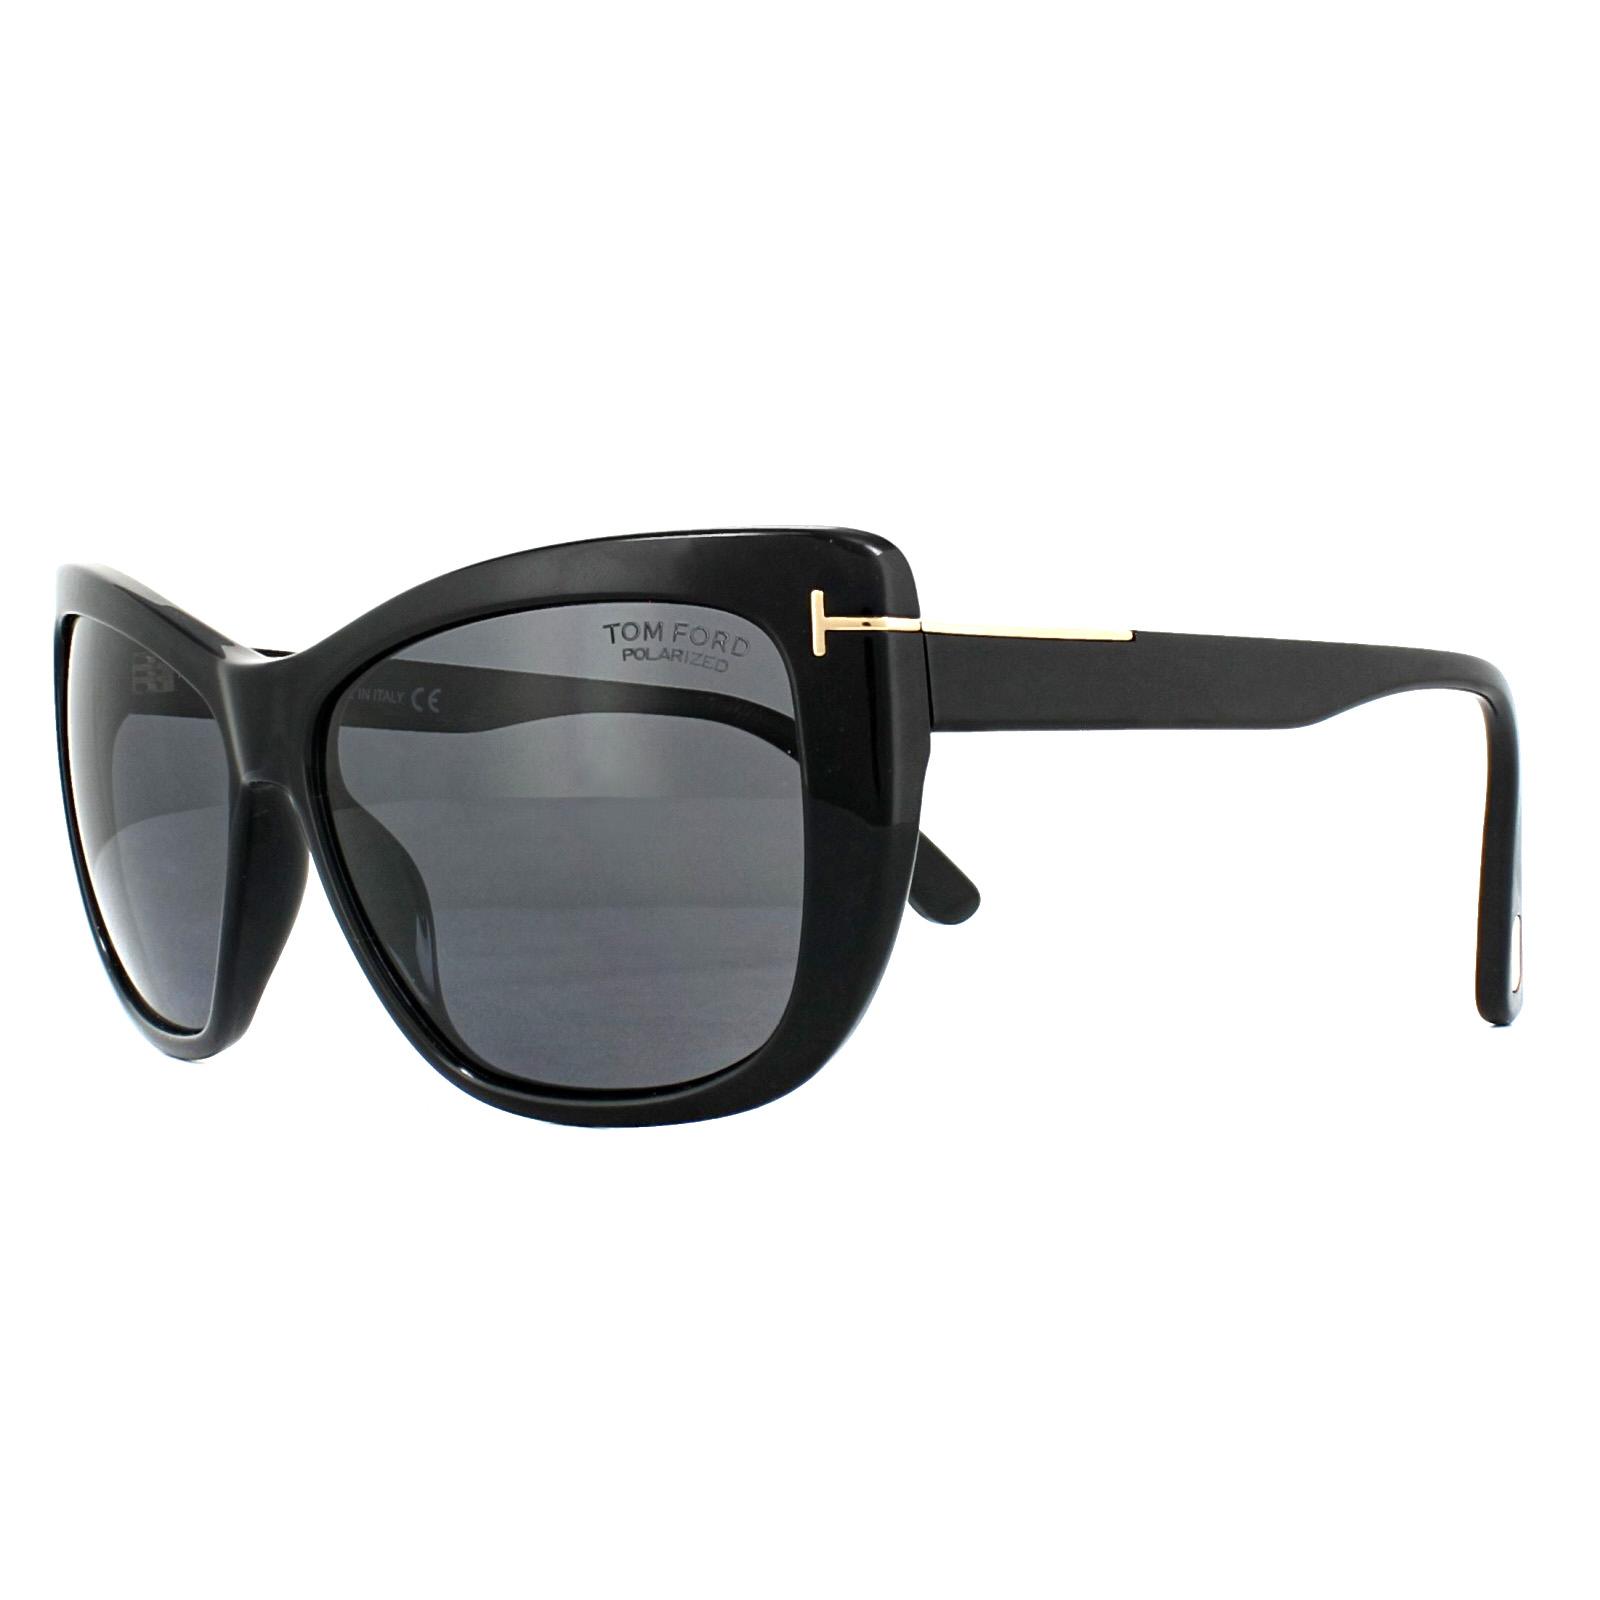 beb5695545 Sentinel Tom Ford Sunglasses 0434 Lindsay 01D Shiny Black Smoke Grey  Polarized